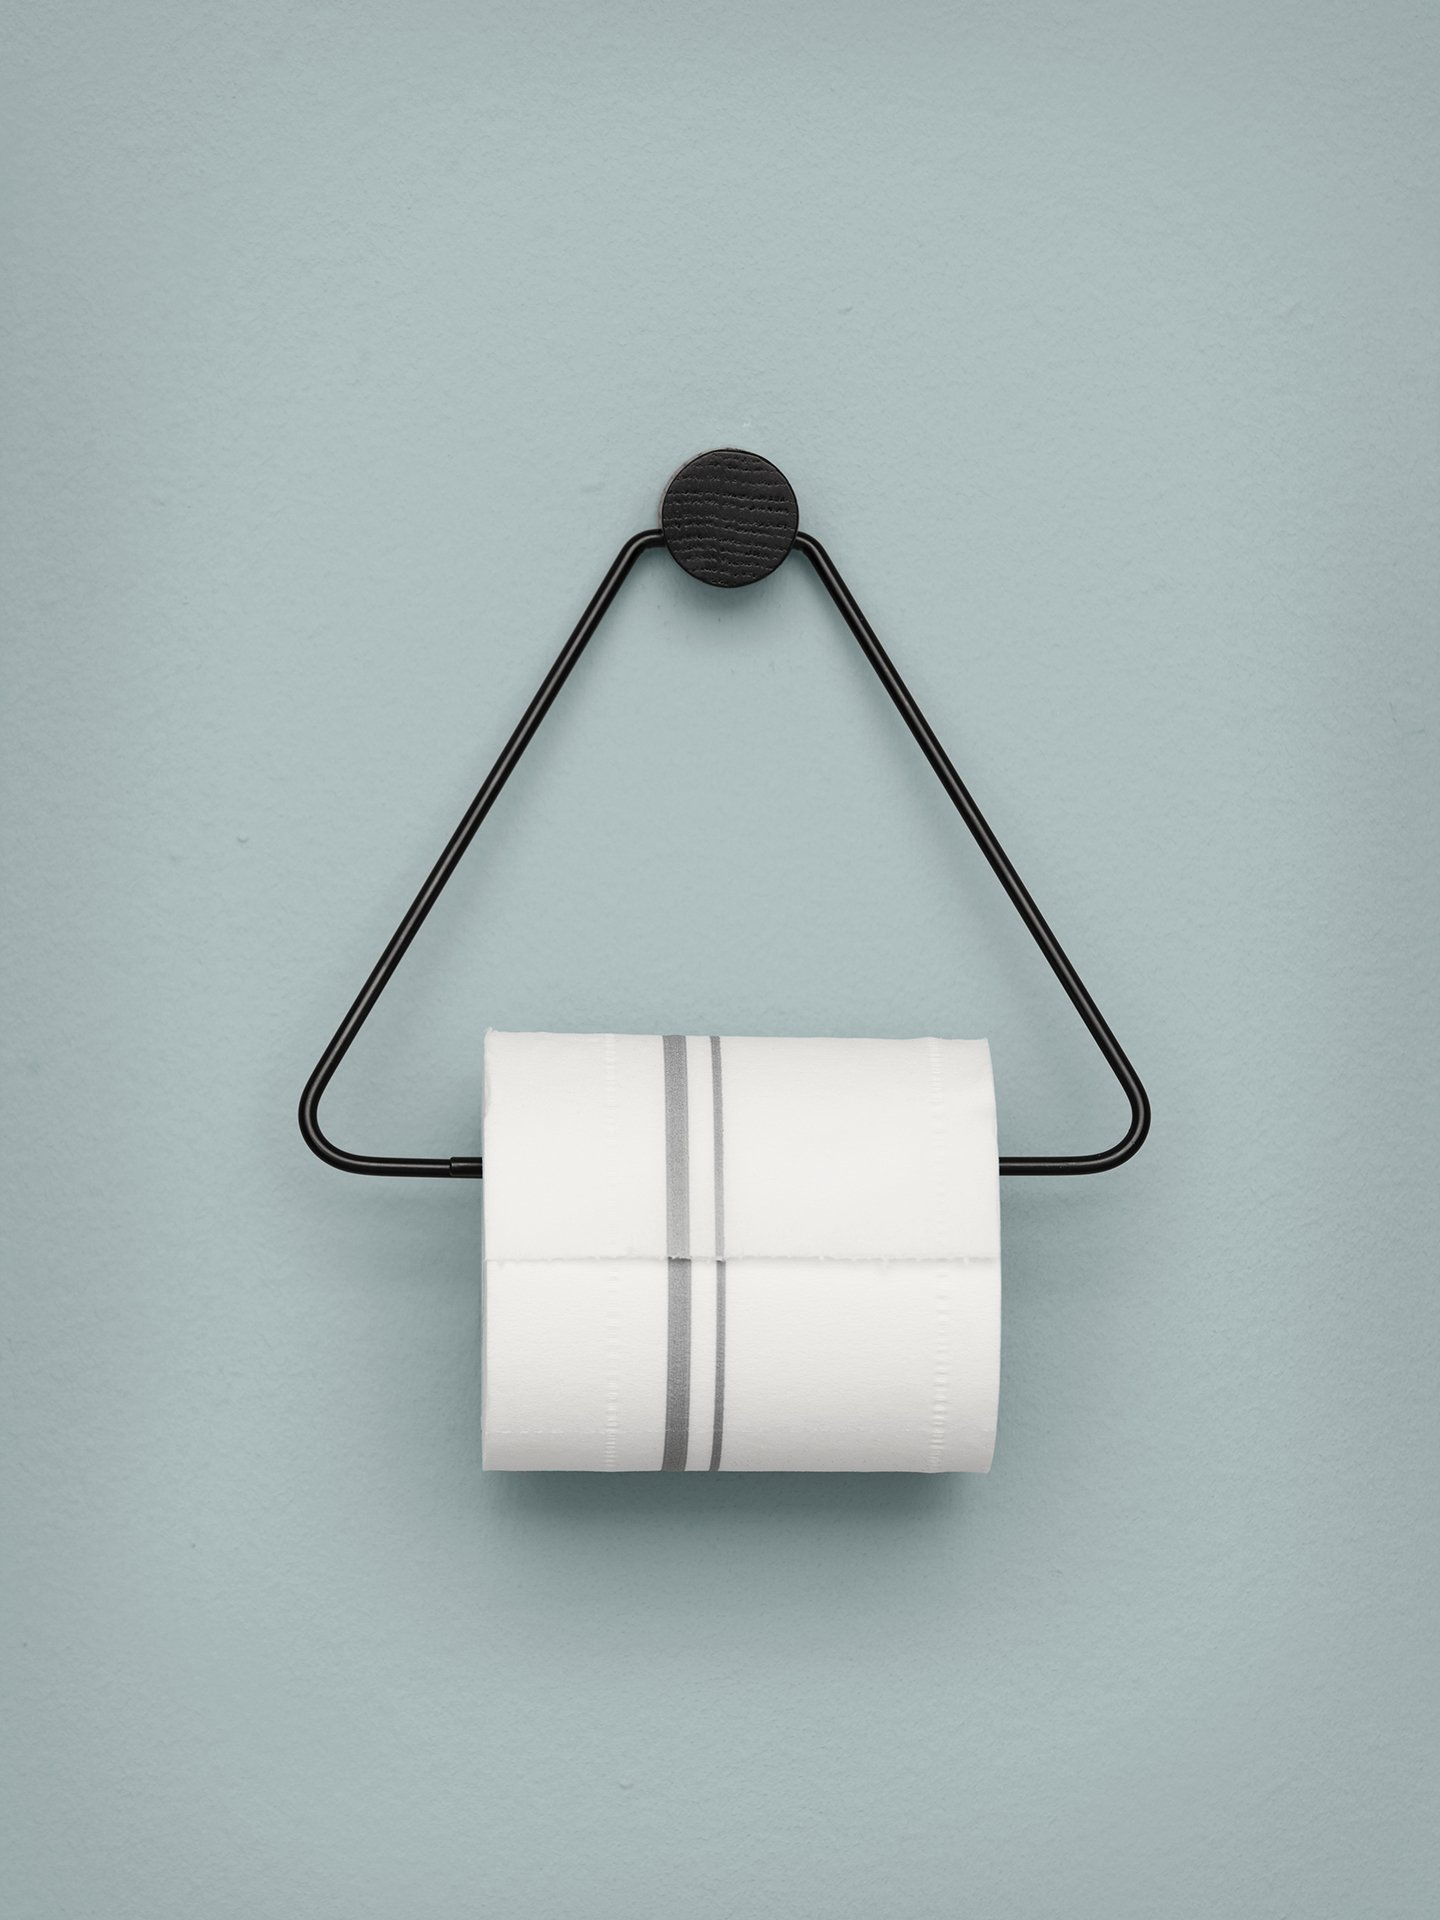 Black triangular toilet paper holder